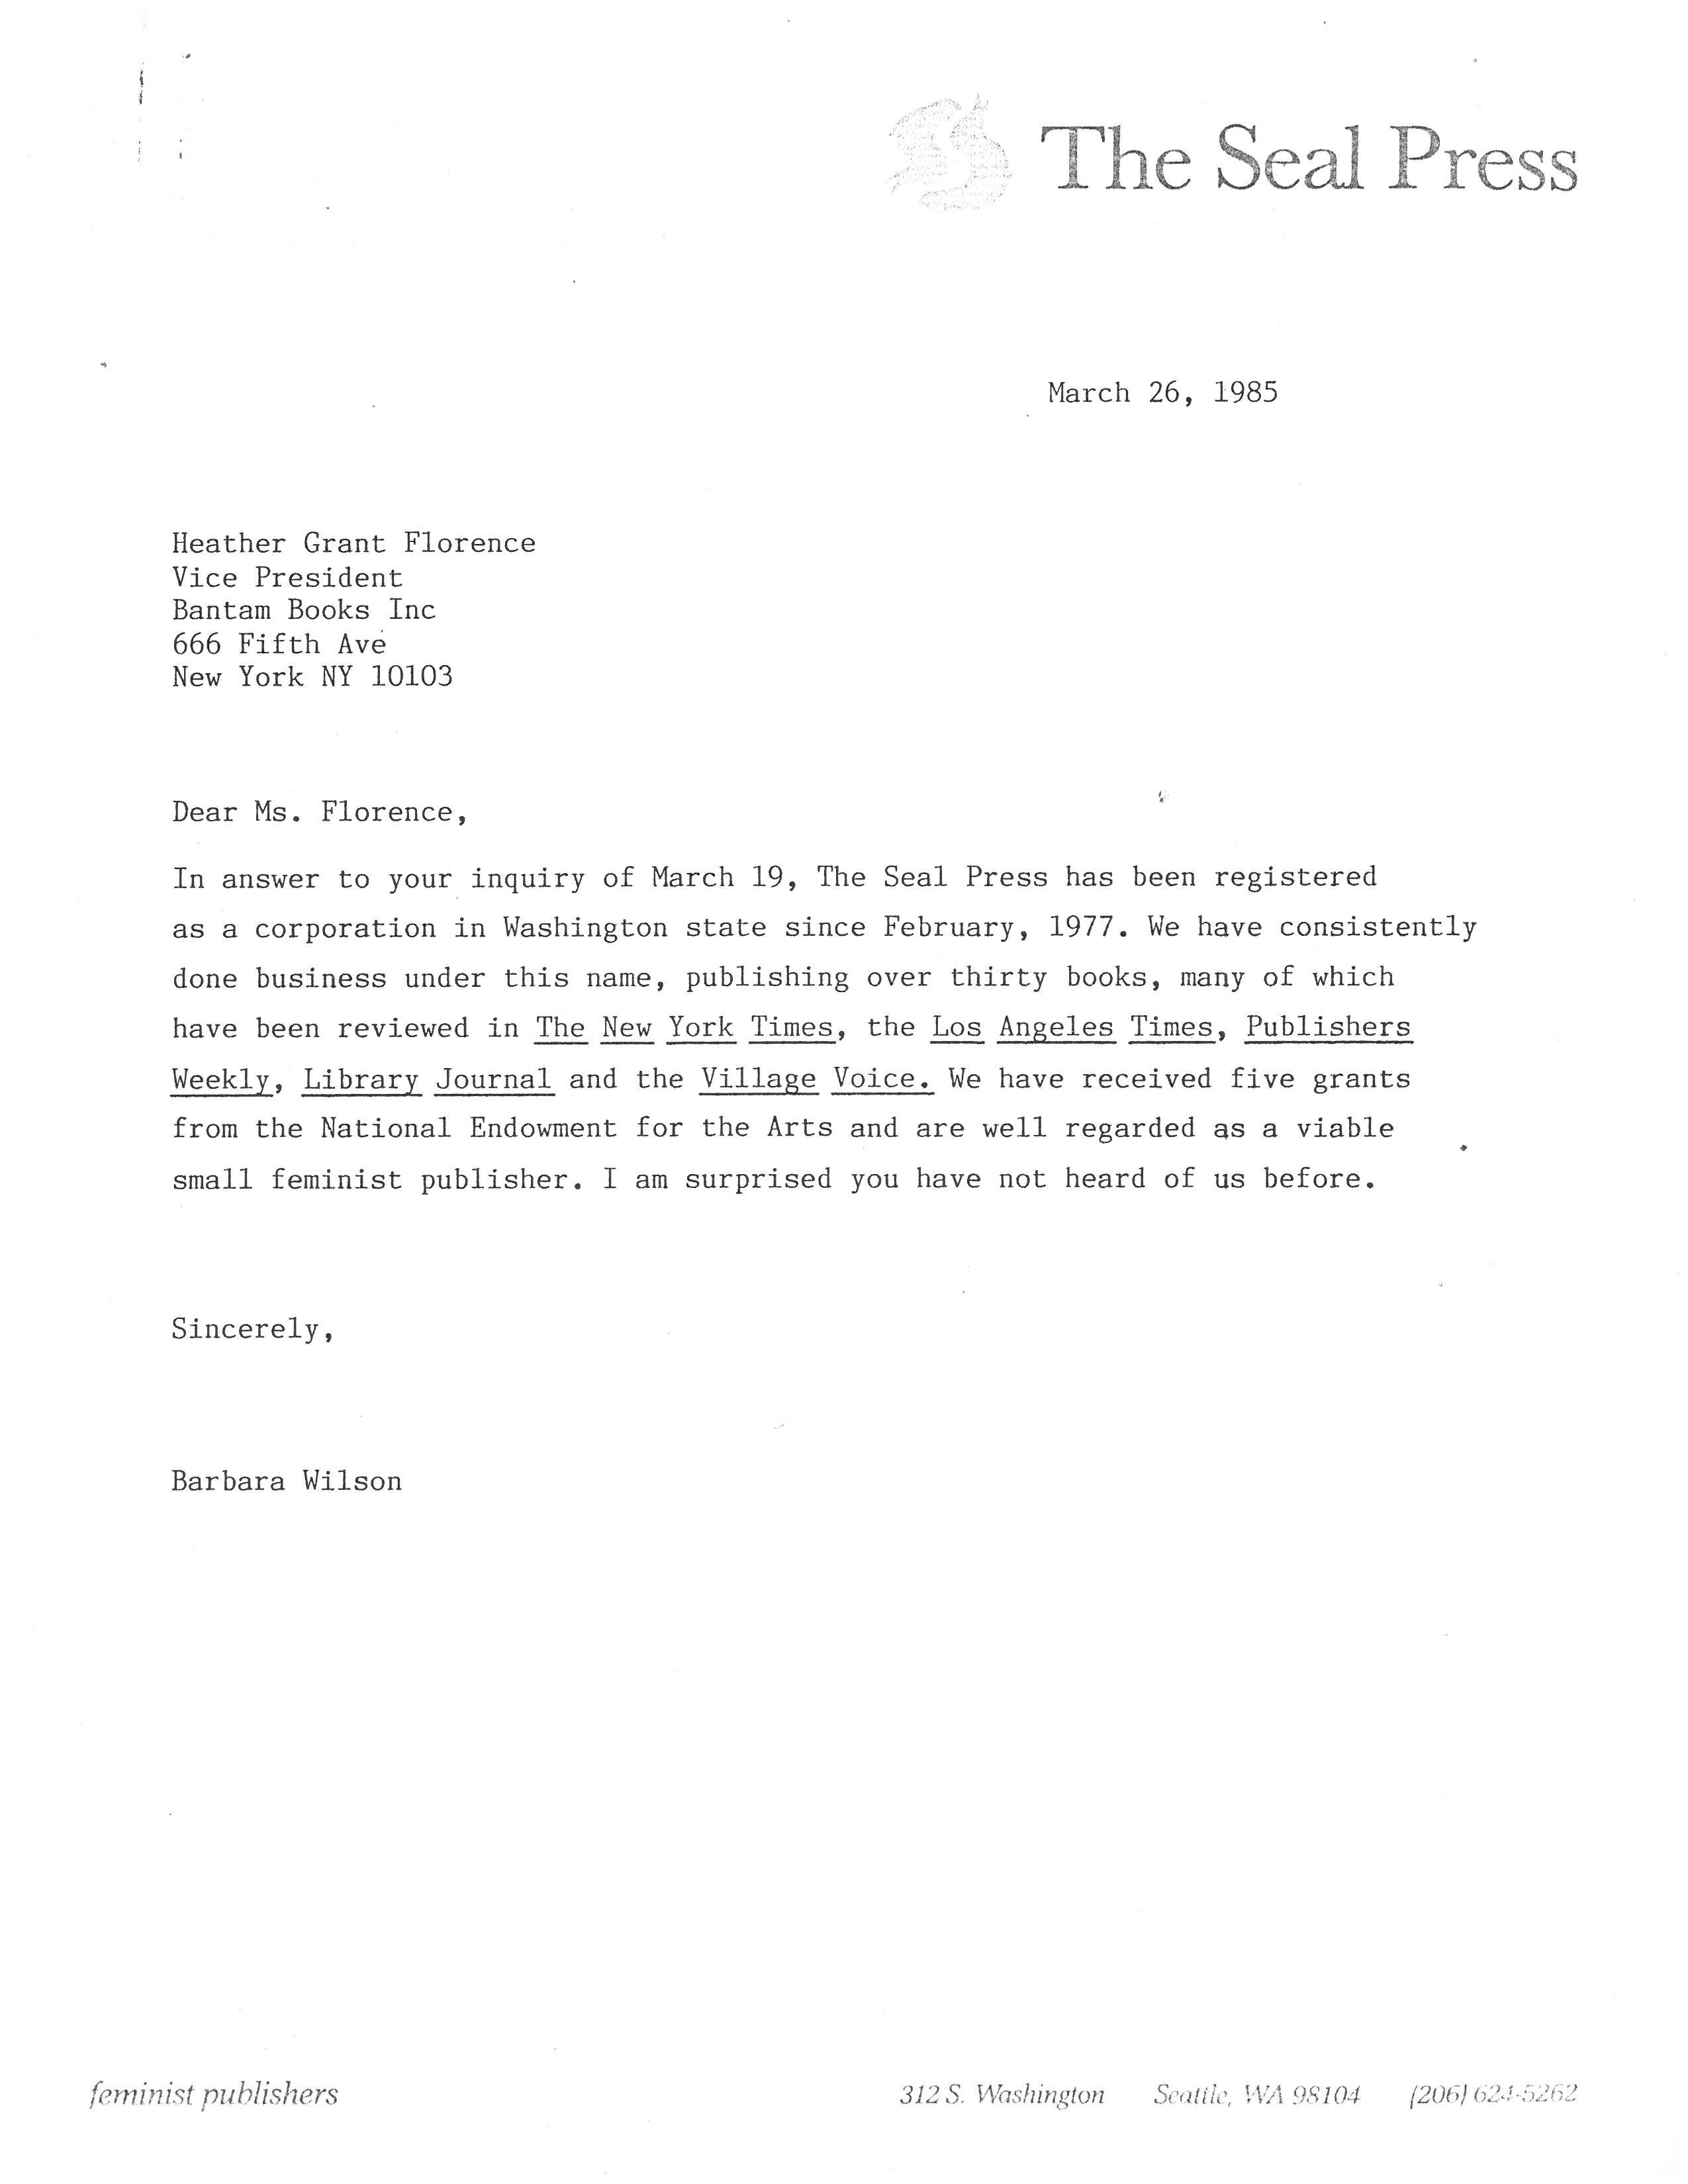 bantam letter